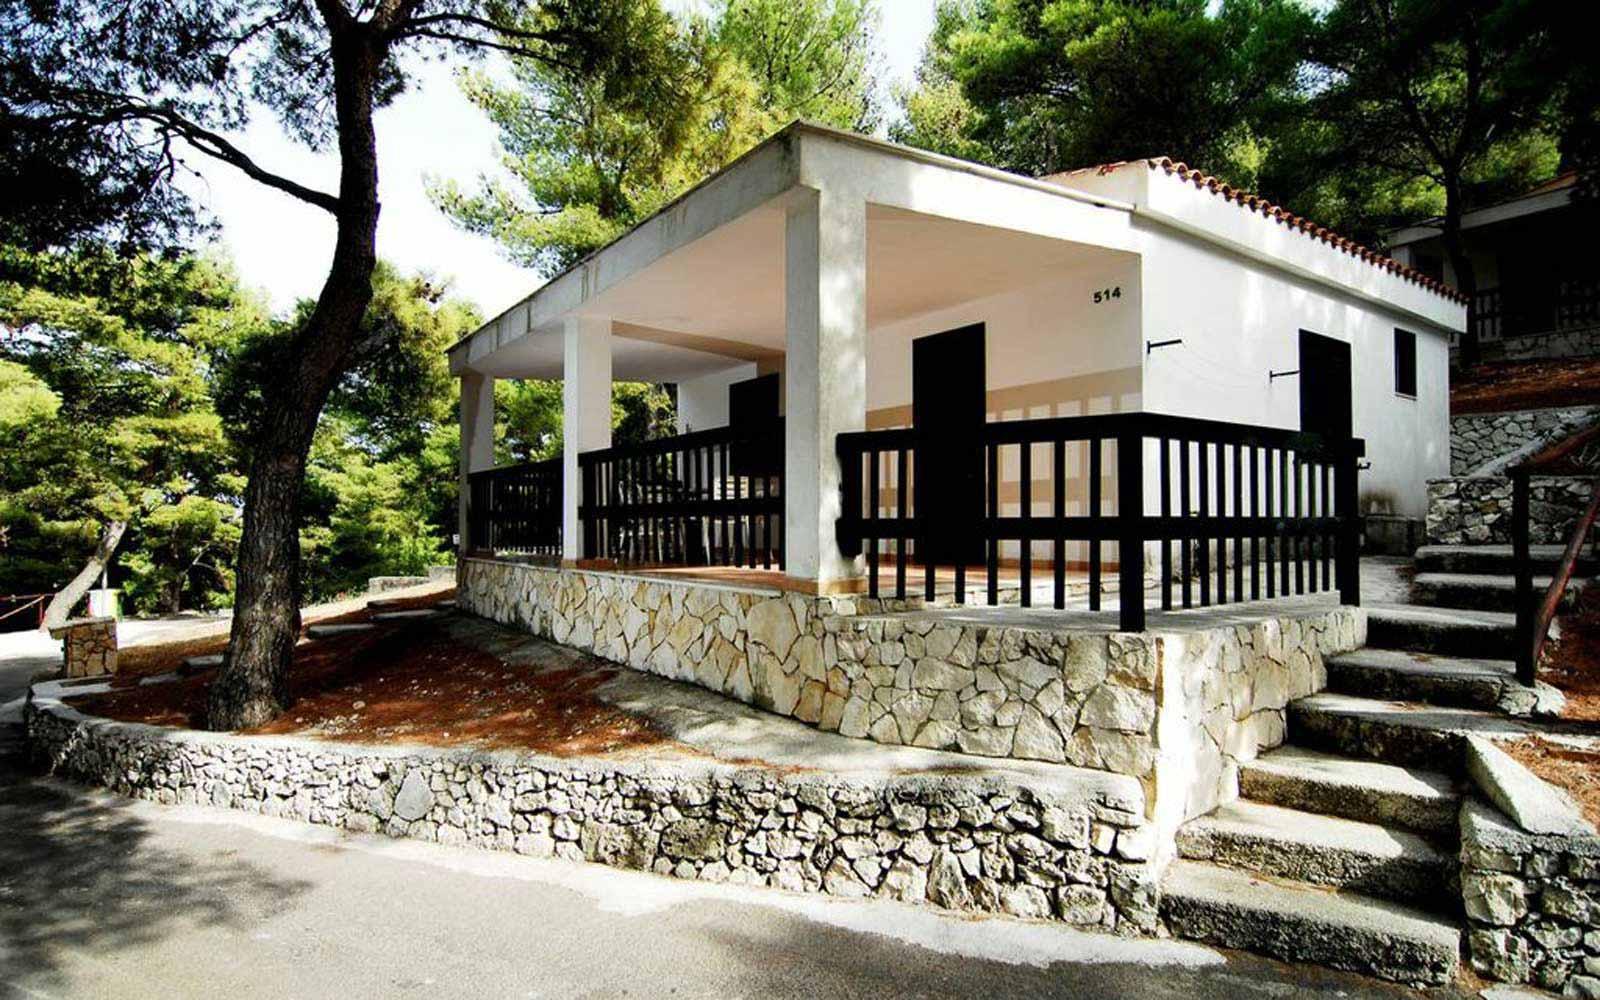 Exterior of the rooms at the Gattarella Resort